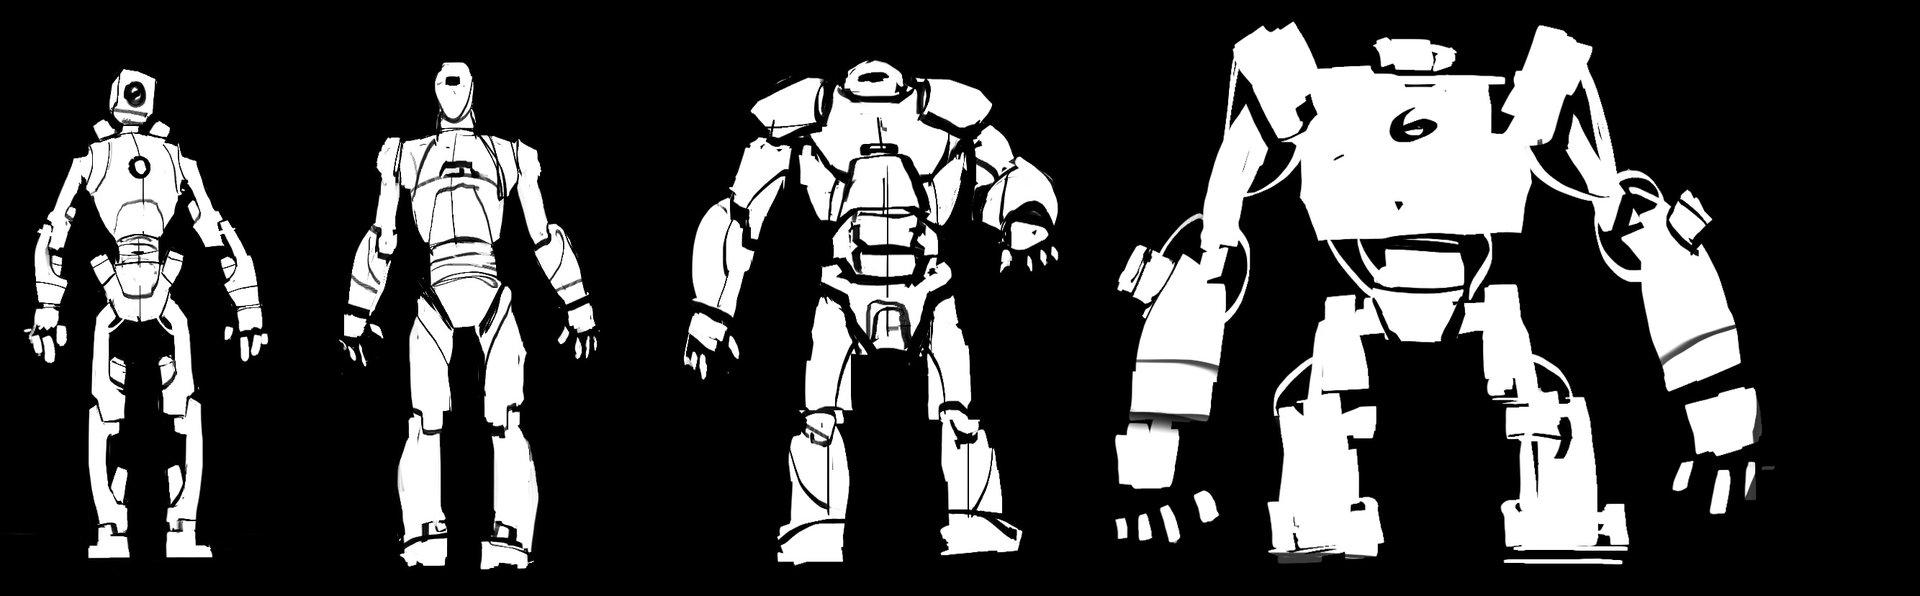 Sviatoslav gerasimchuk robots classes